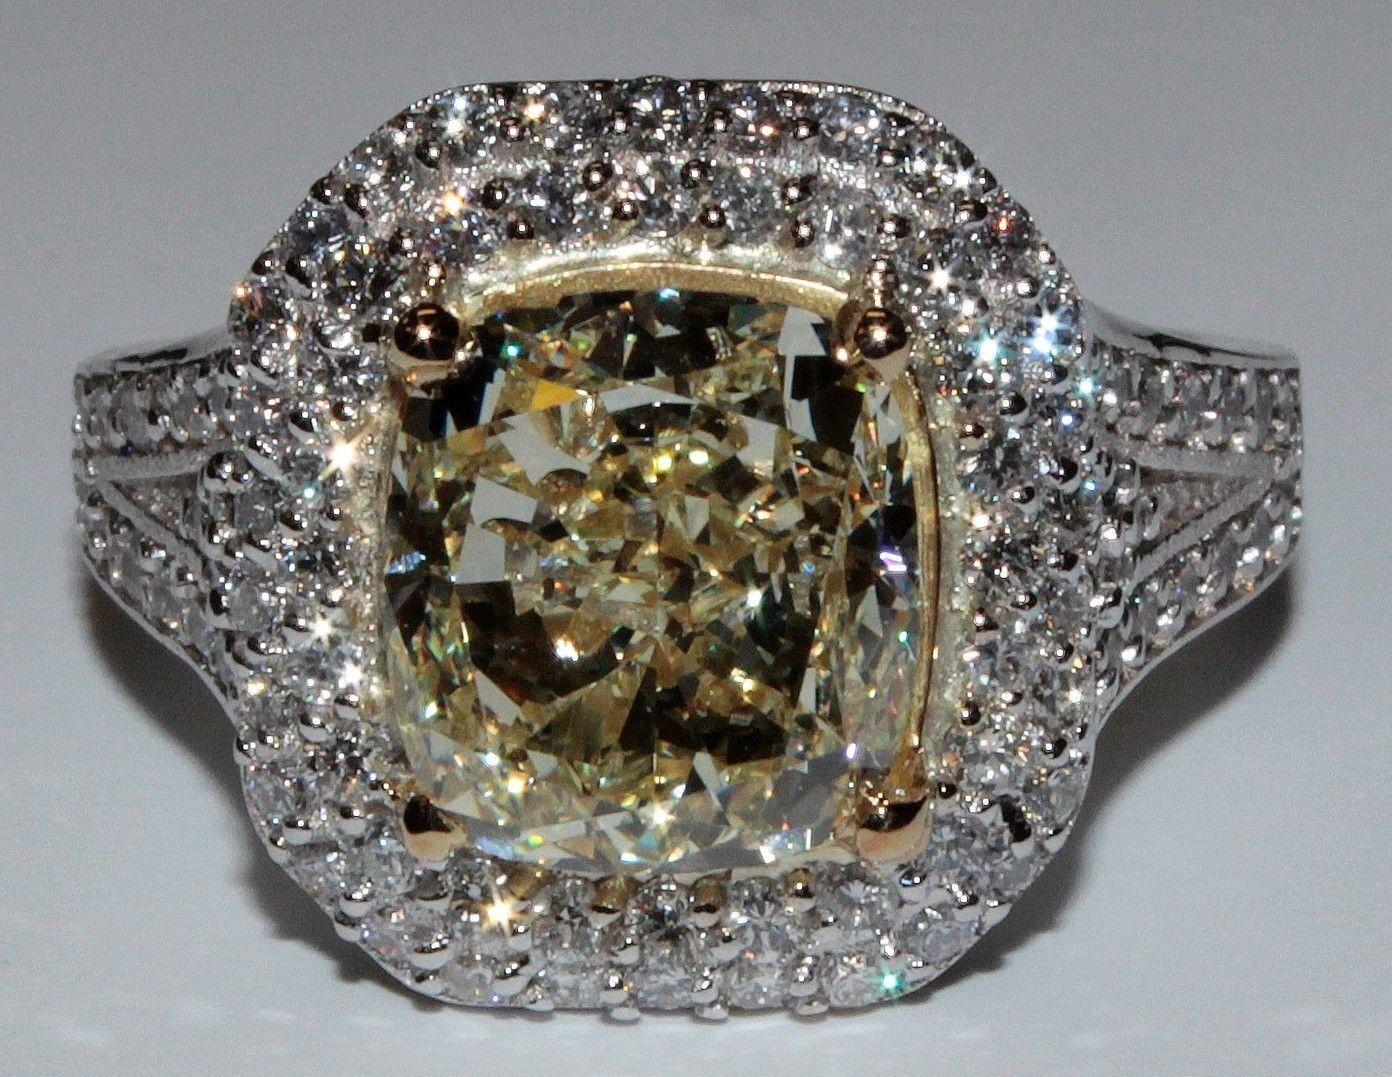 Fancy Yellow GIA Certified 2.25 Ct Cushion Cut Diamond Engagement Ring 18k Gold